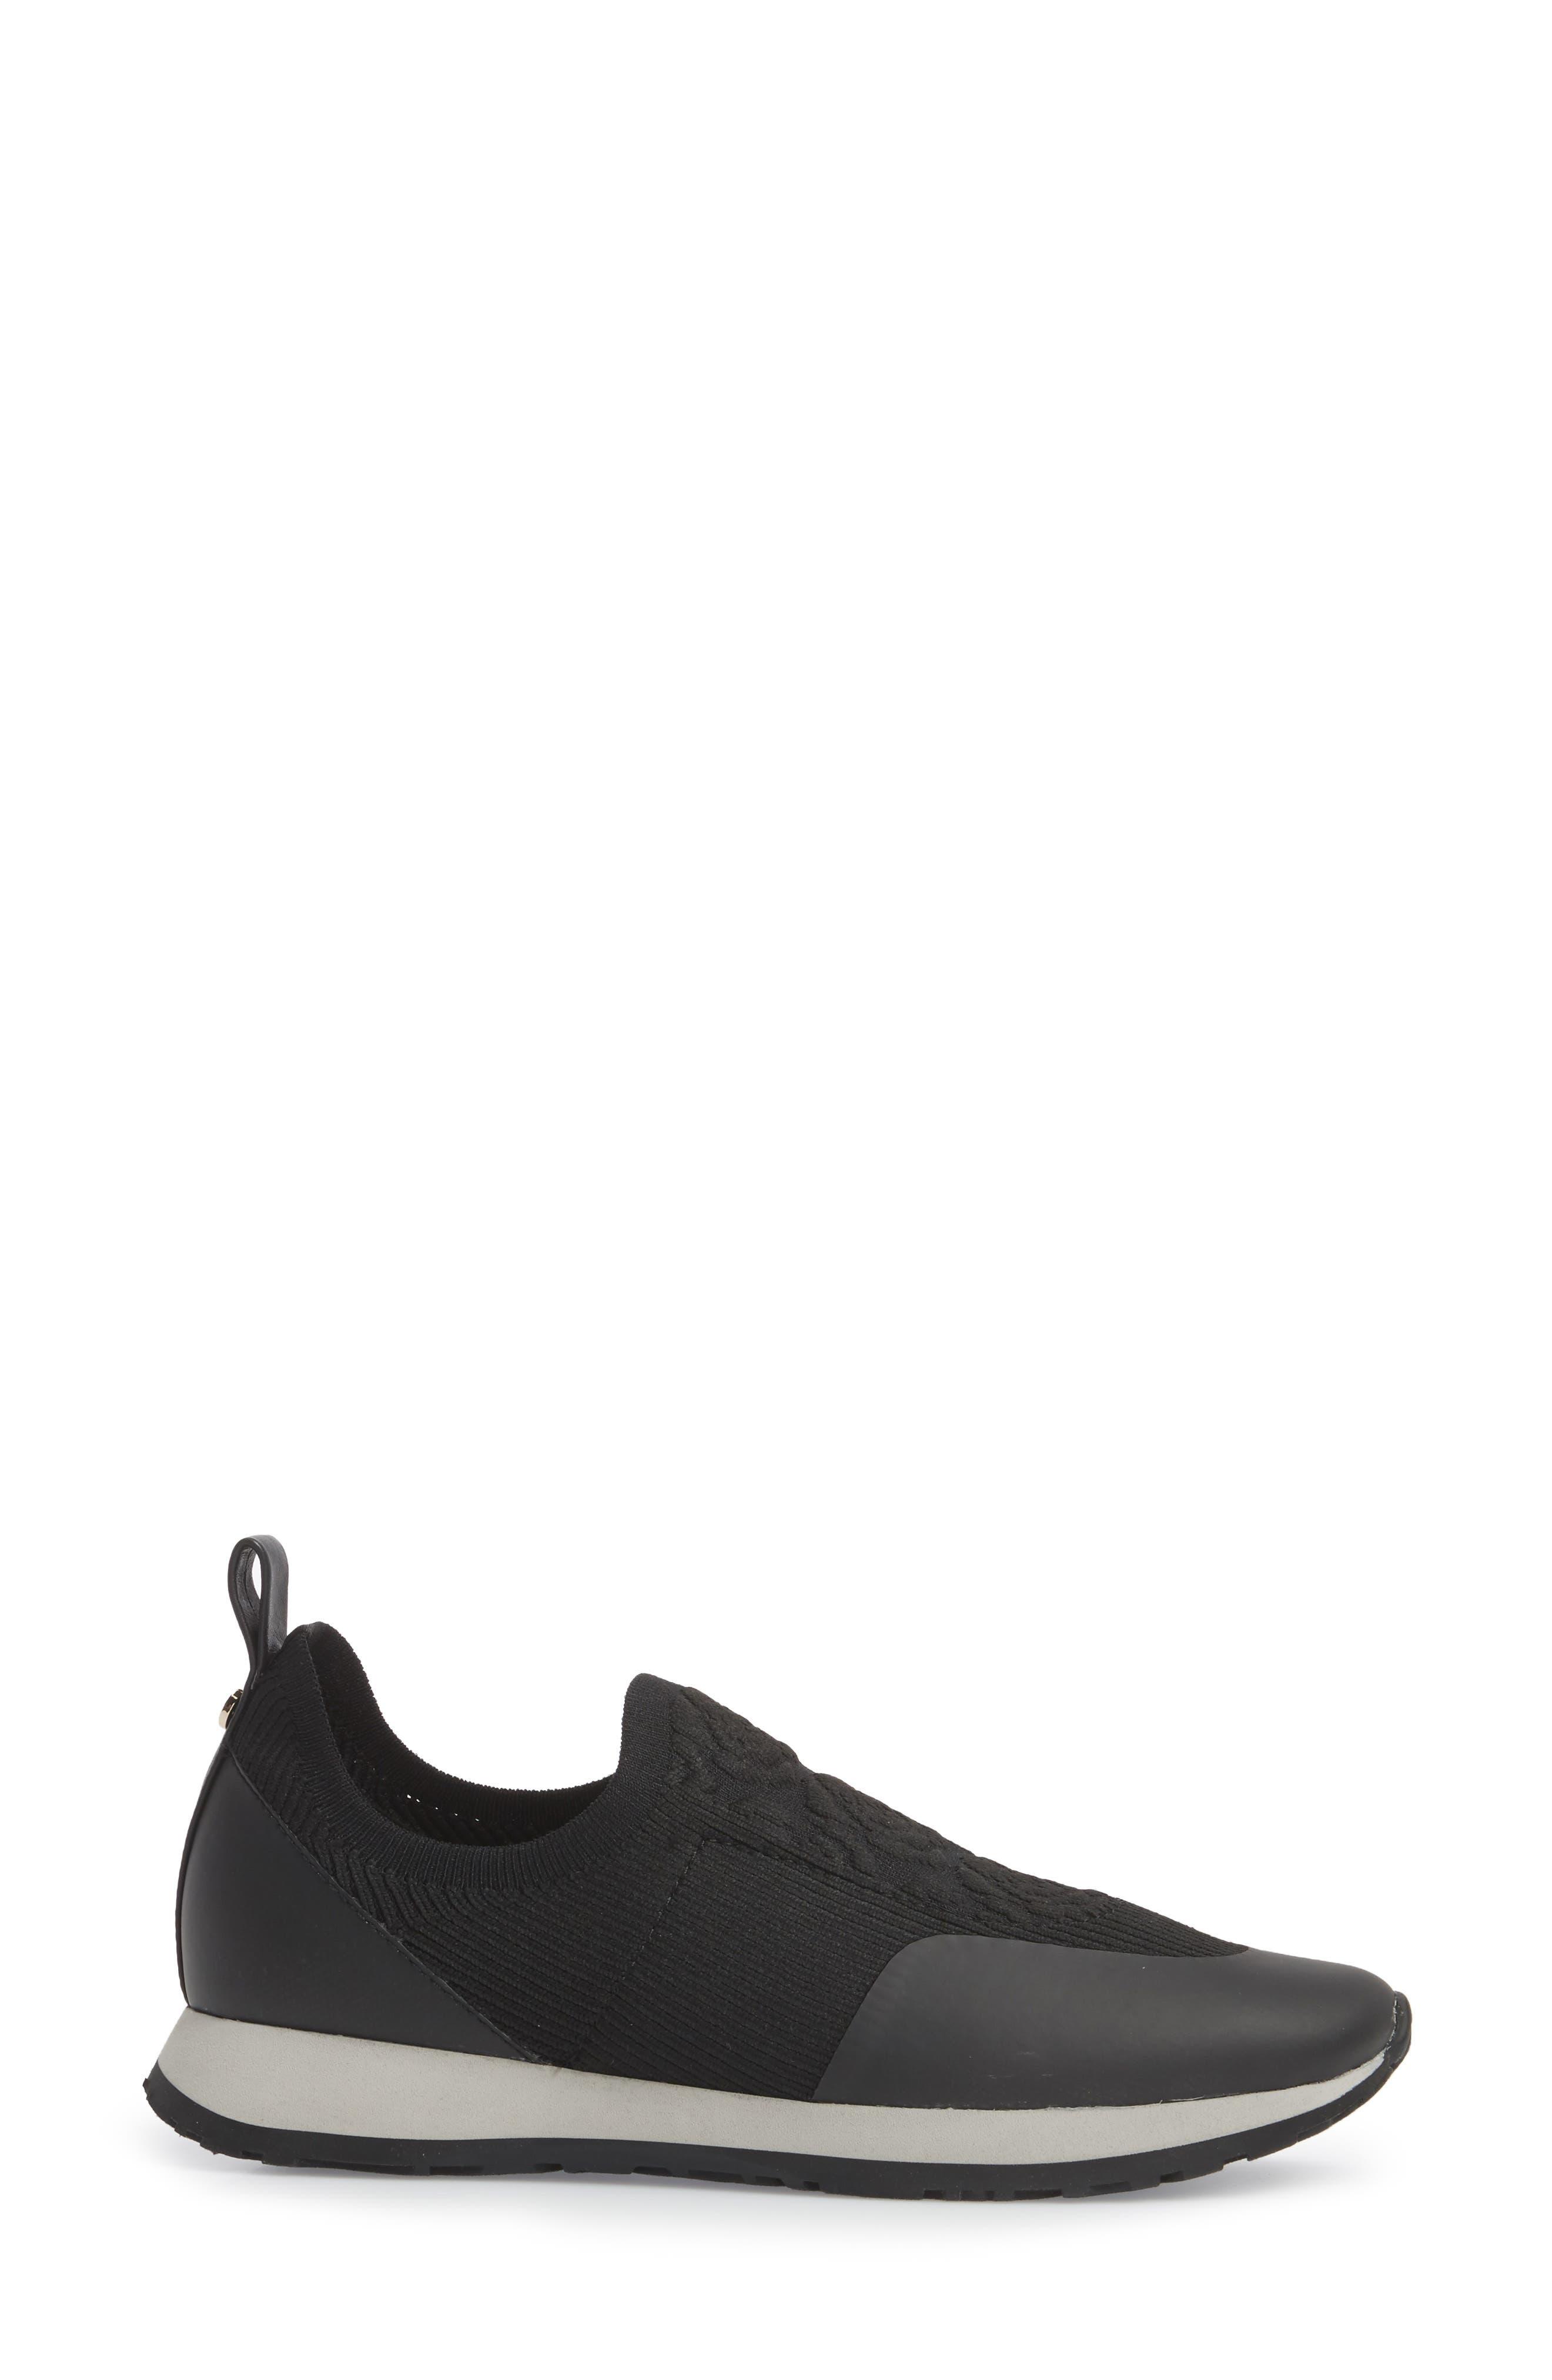 Cara Slip-On Sneaker,                             Alternate thumbnail 3, color,                             Black Fabric